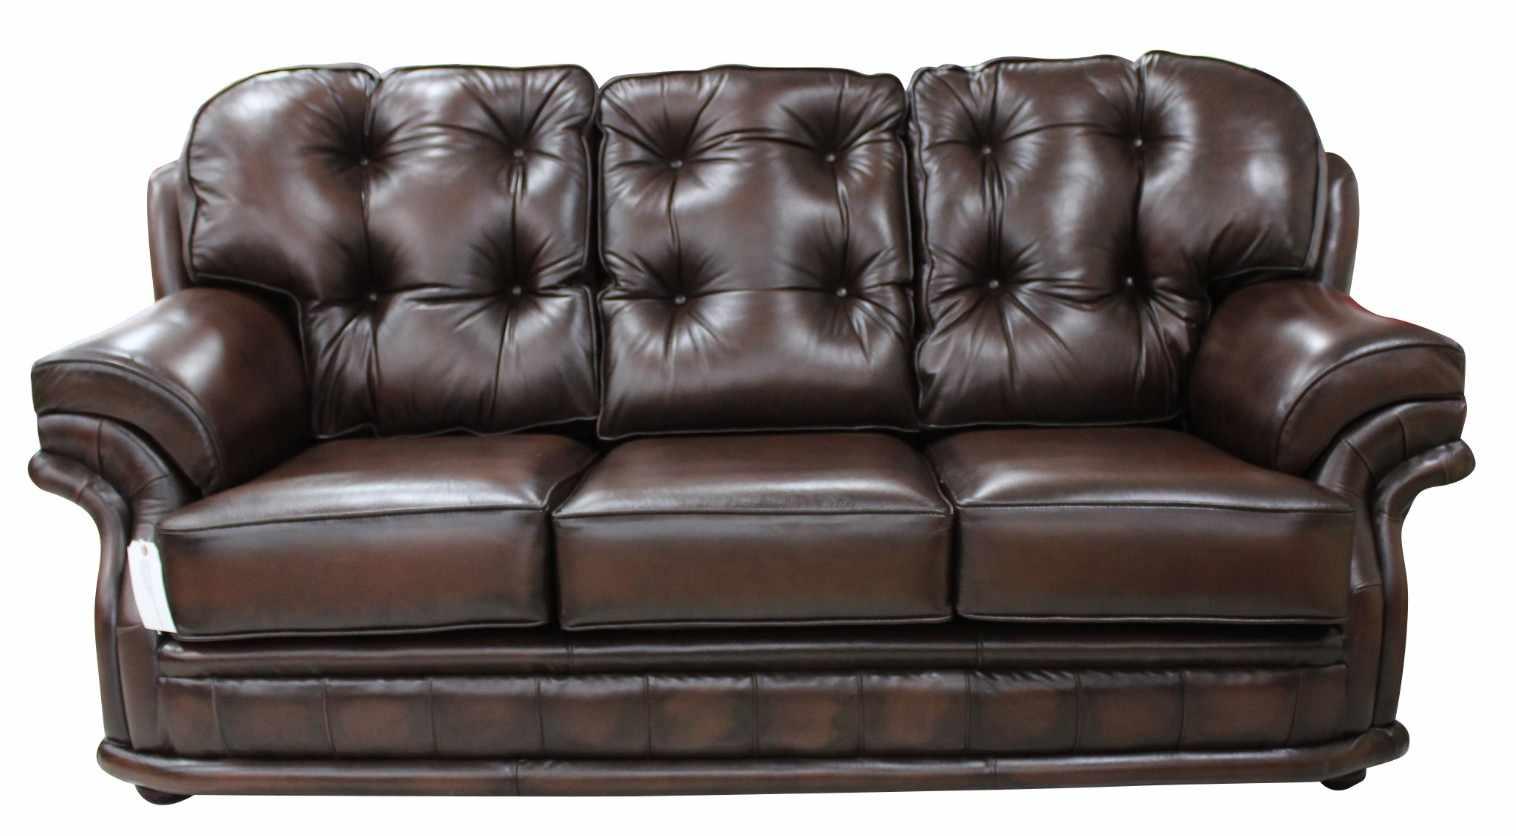 Rub Off Antique Brown leather Chesterfield Knightsbridge 3 Seater Settee  Traditional Sofa | DesignerSofa4U